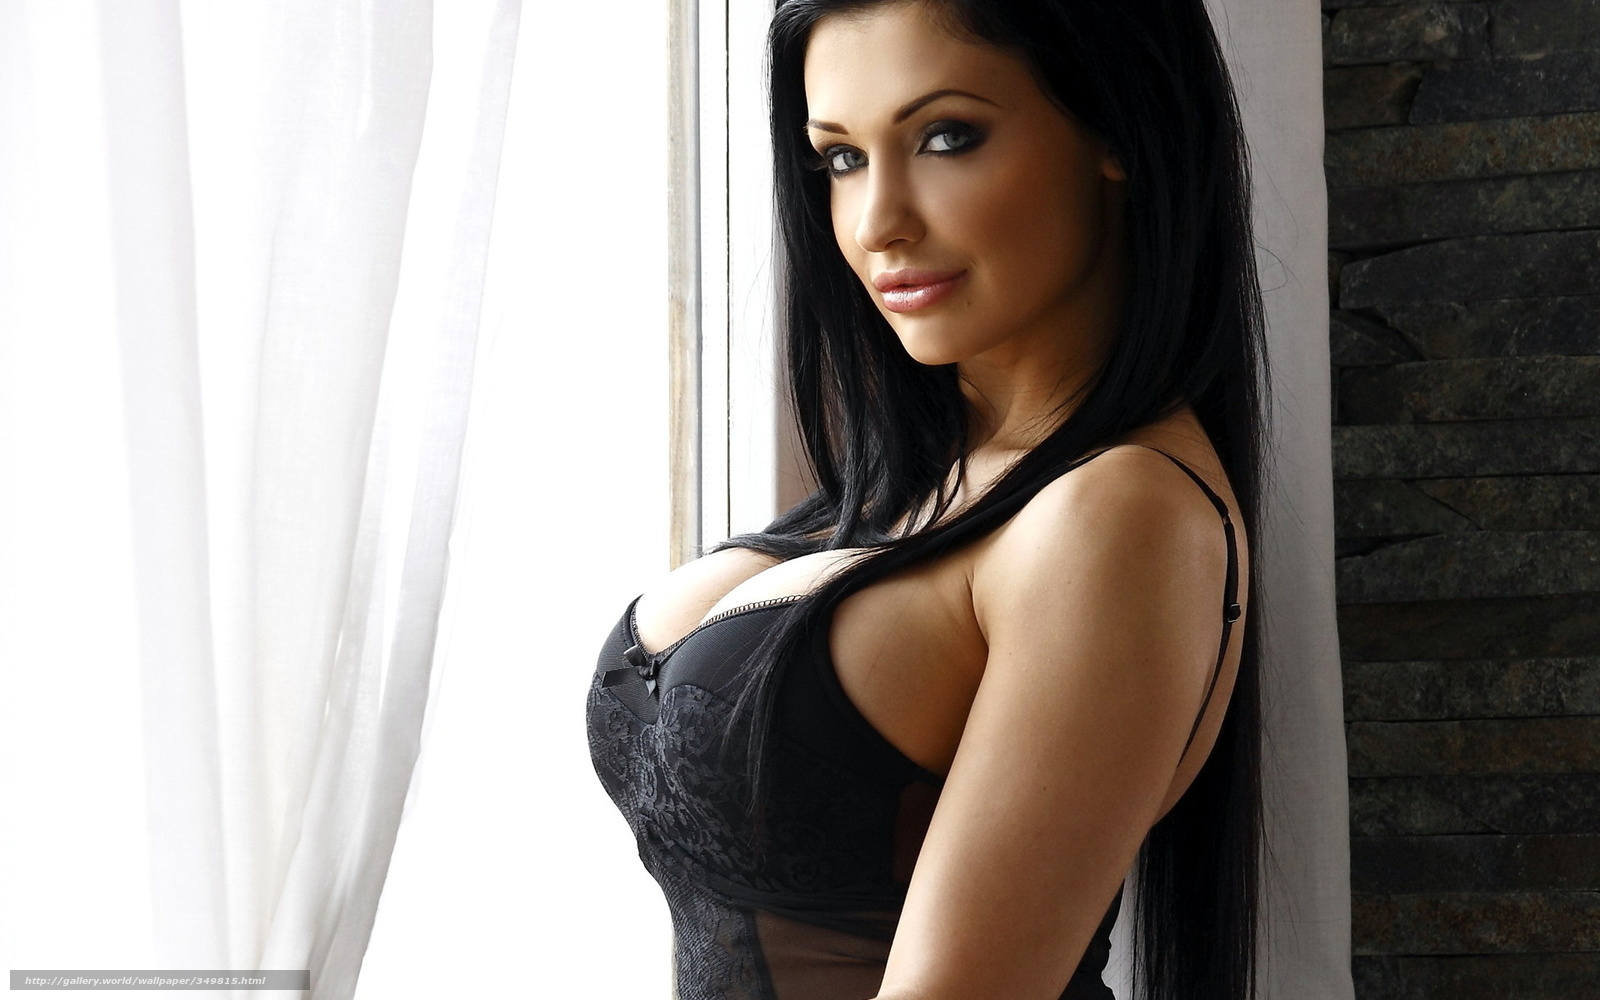 Фото девушки с табличкой на груди 17 фотография